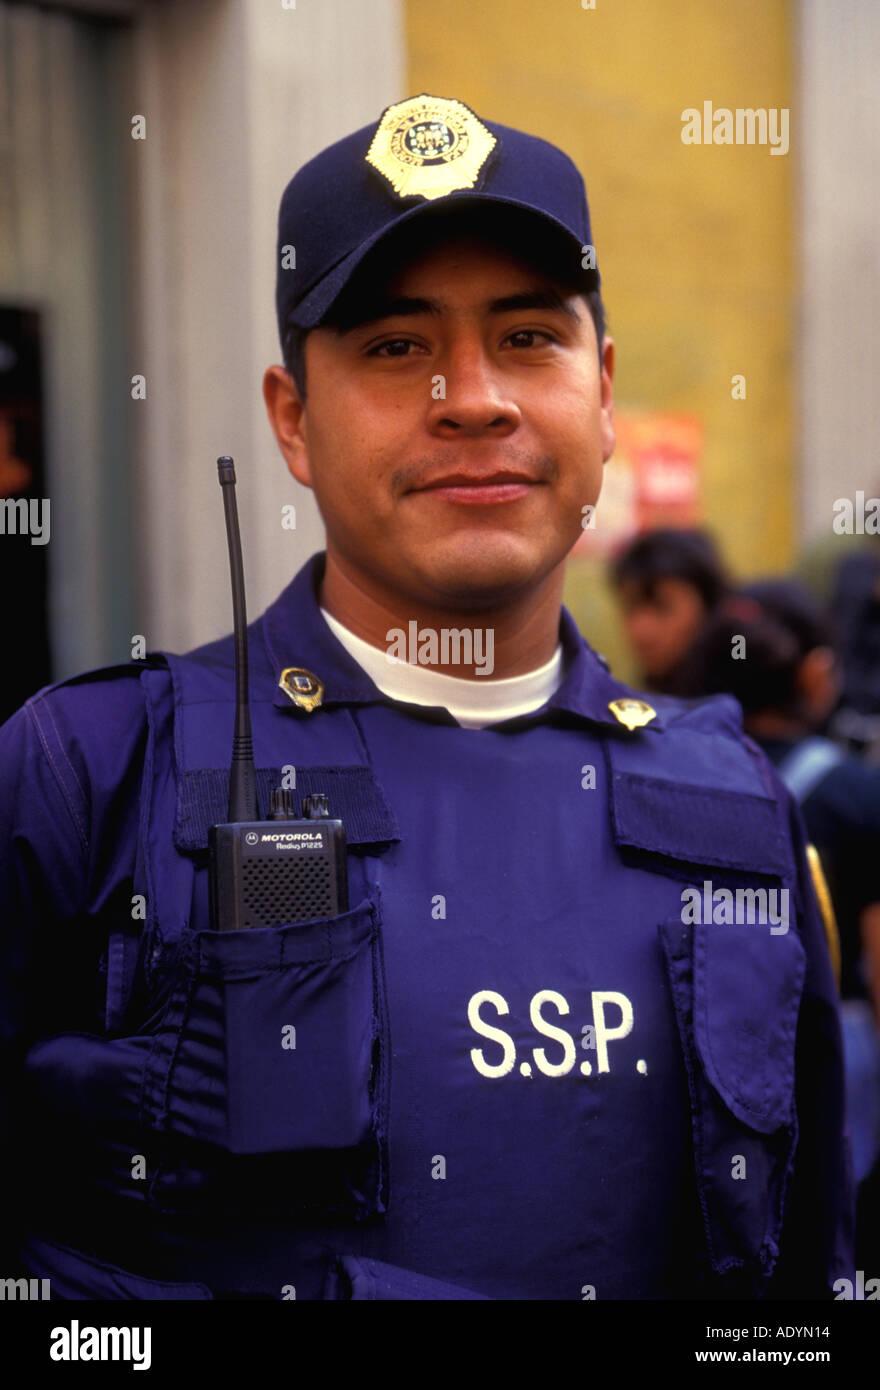 effa1b4cc94 Police Bulletproof Vest Stock Photos   Police Bulletproof Vest Stock ...